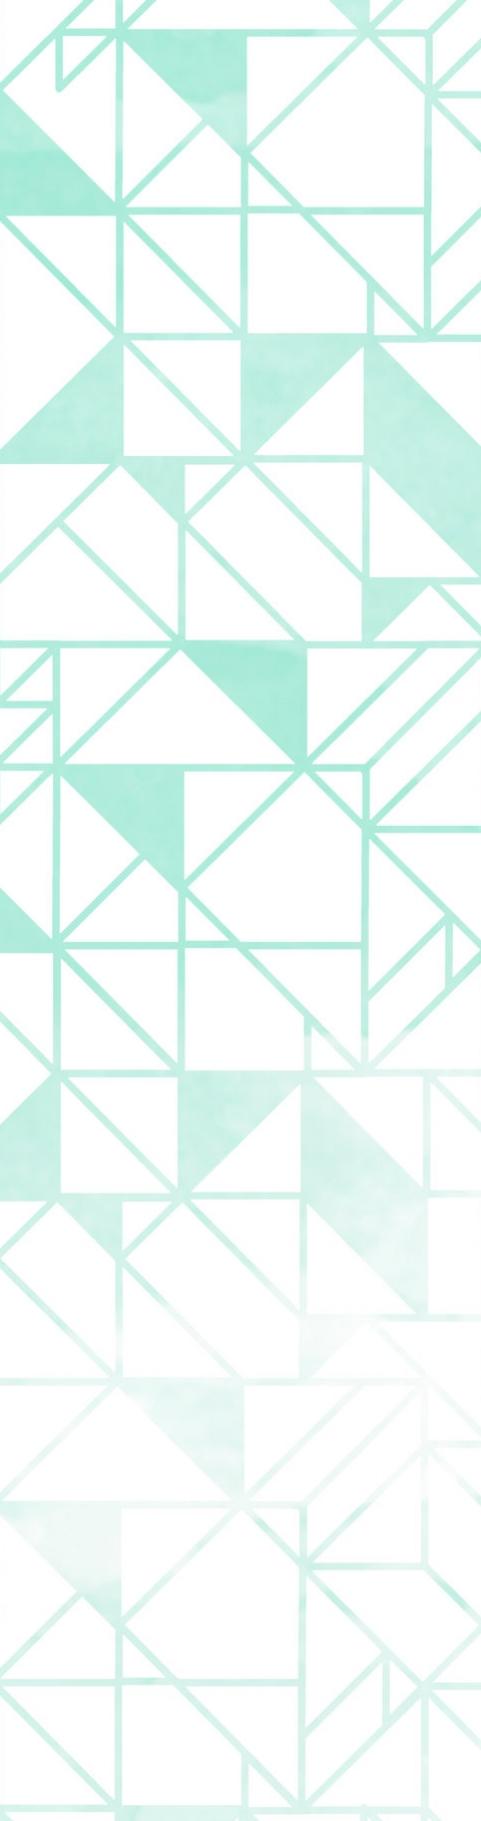 background geometric 4.jpg